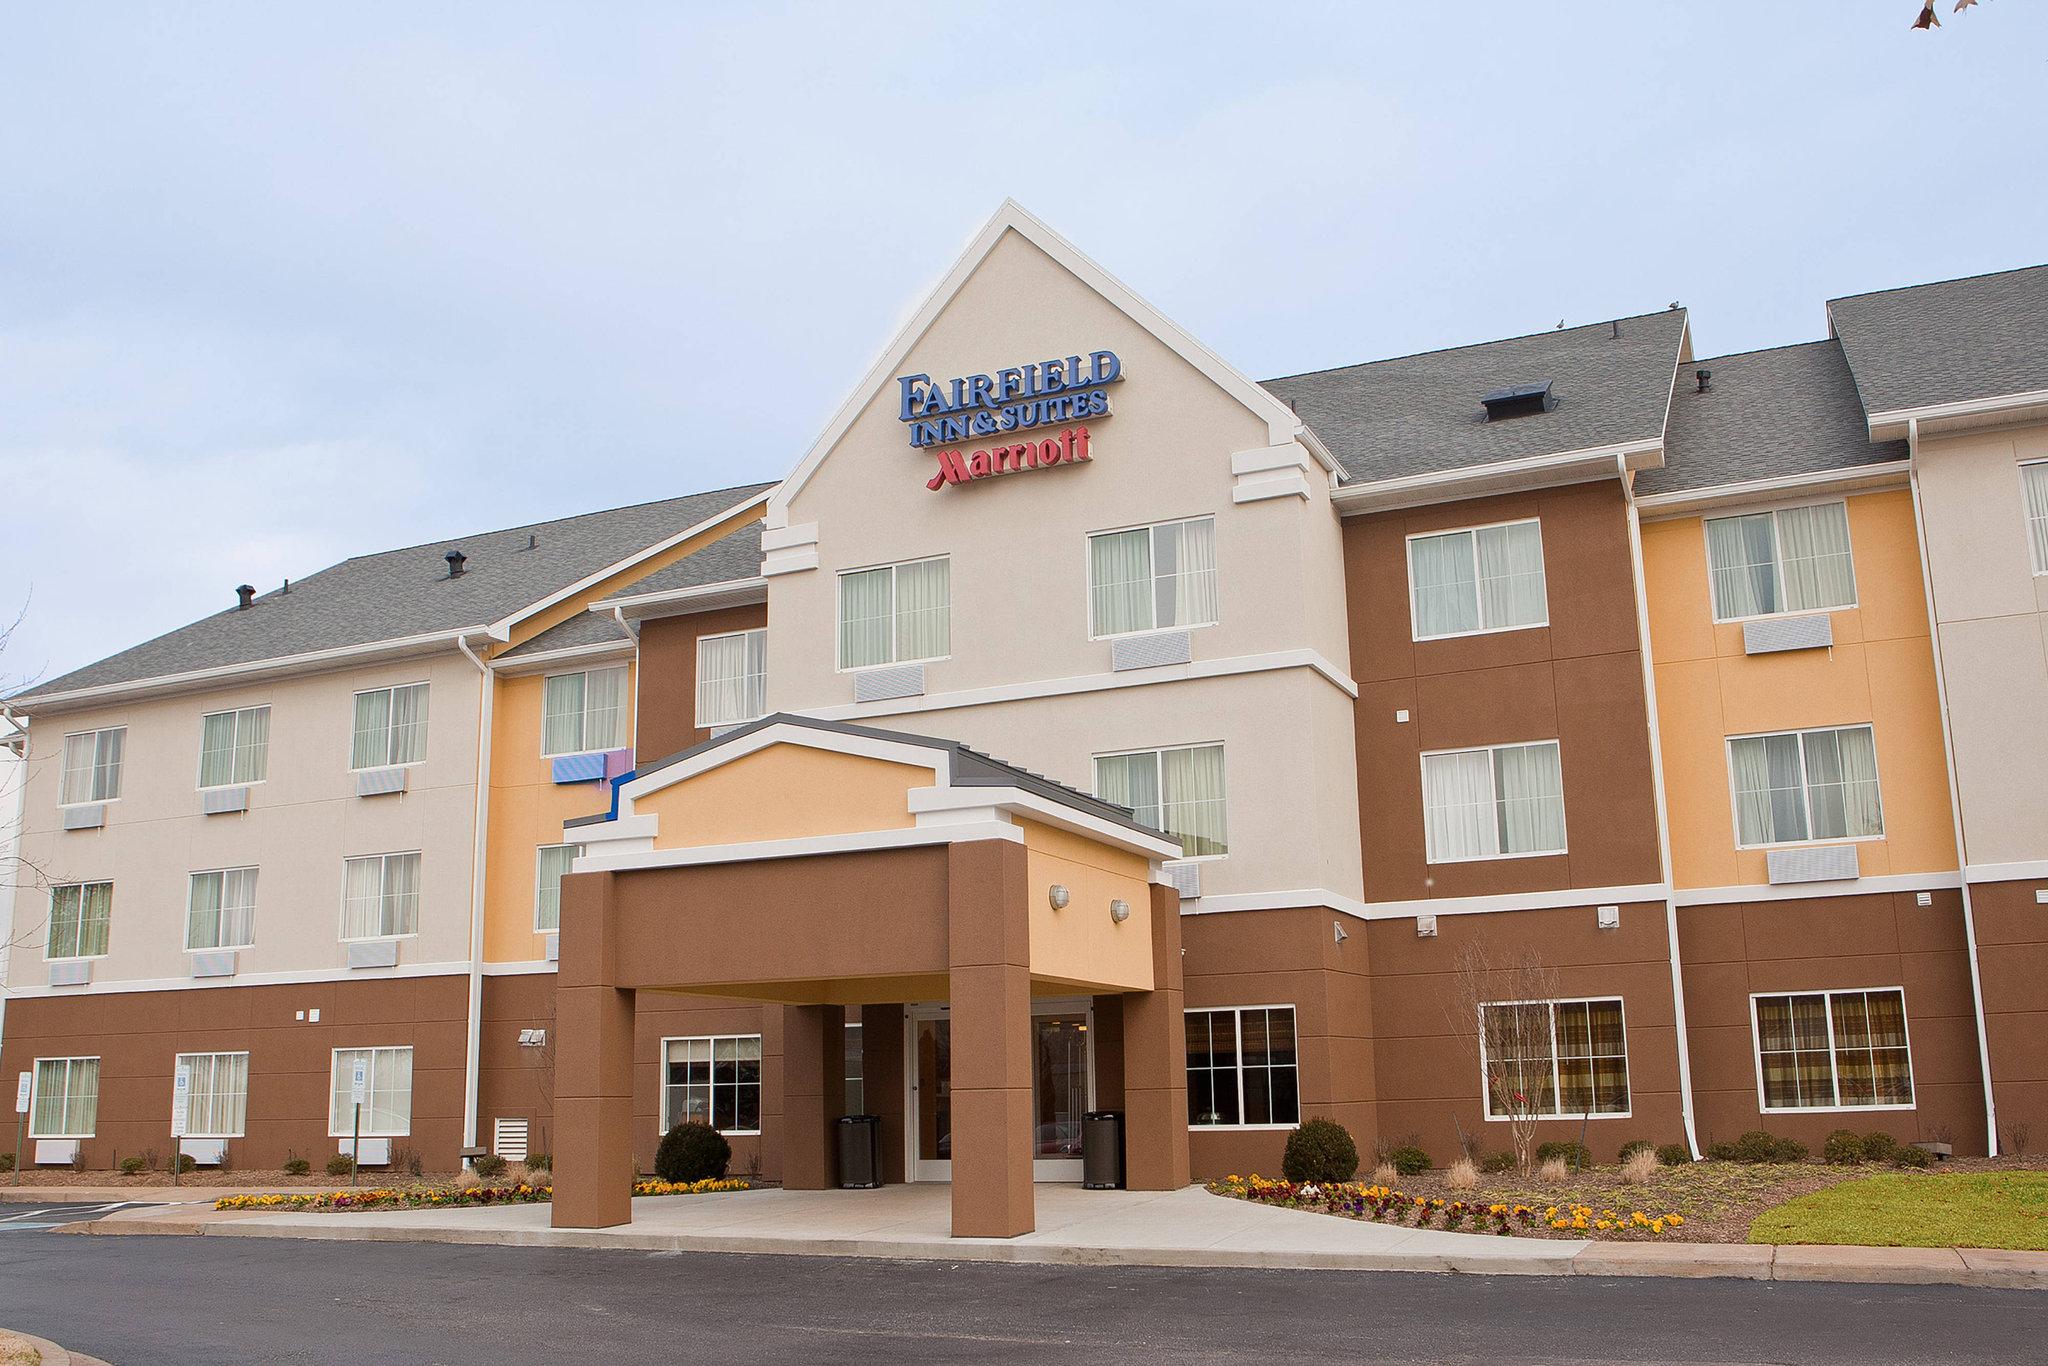 Fairfield Inn & Suites Memphis East